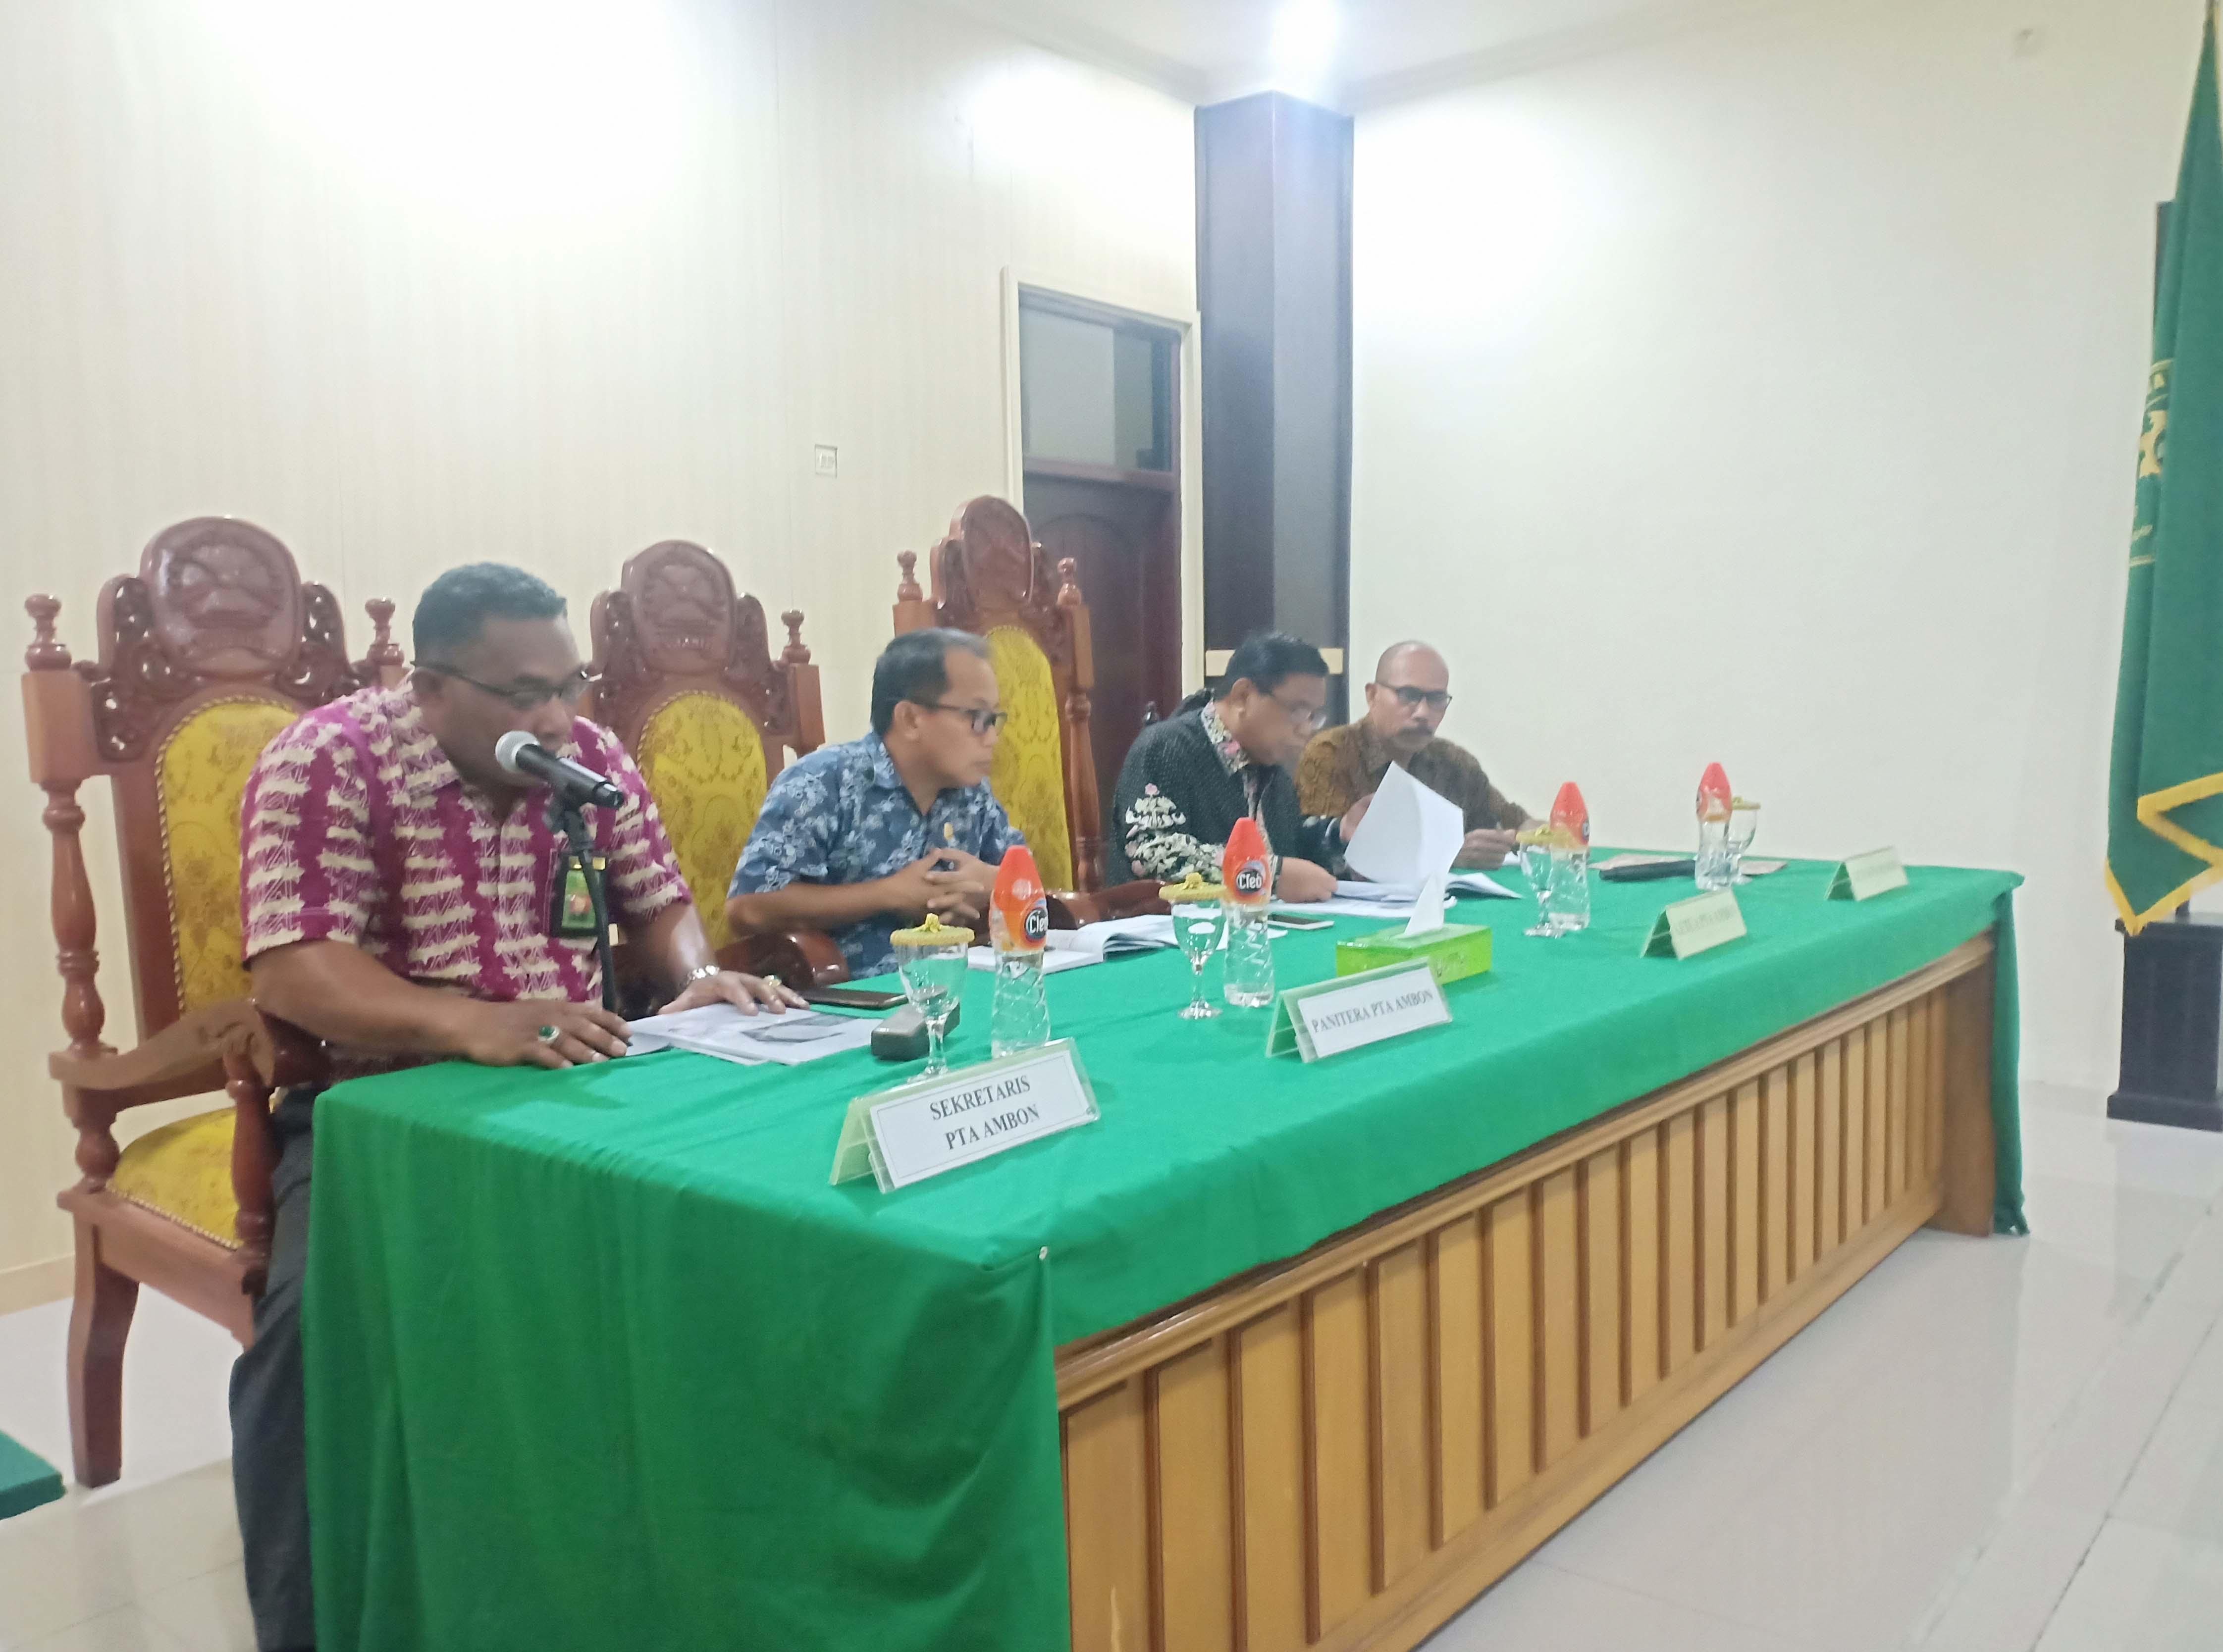 Rapat Pembinaan Tim PTA Ambon